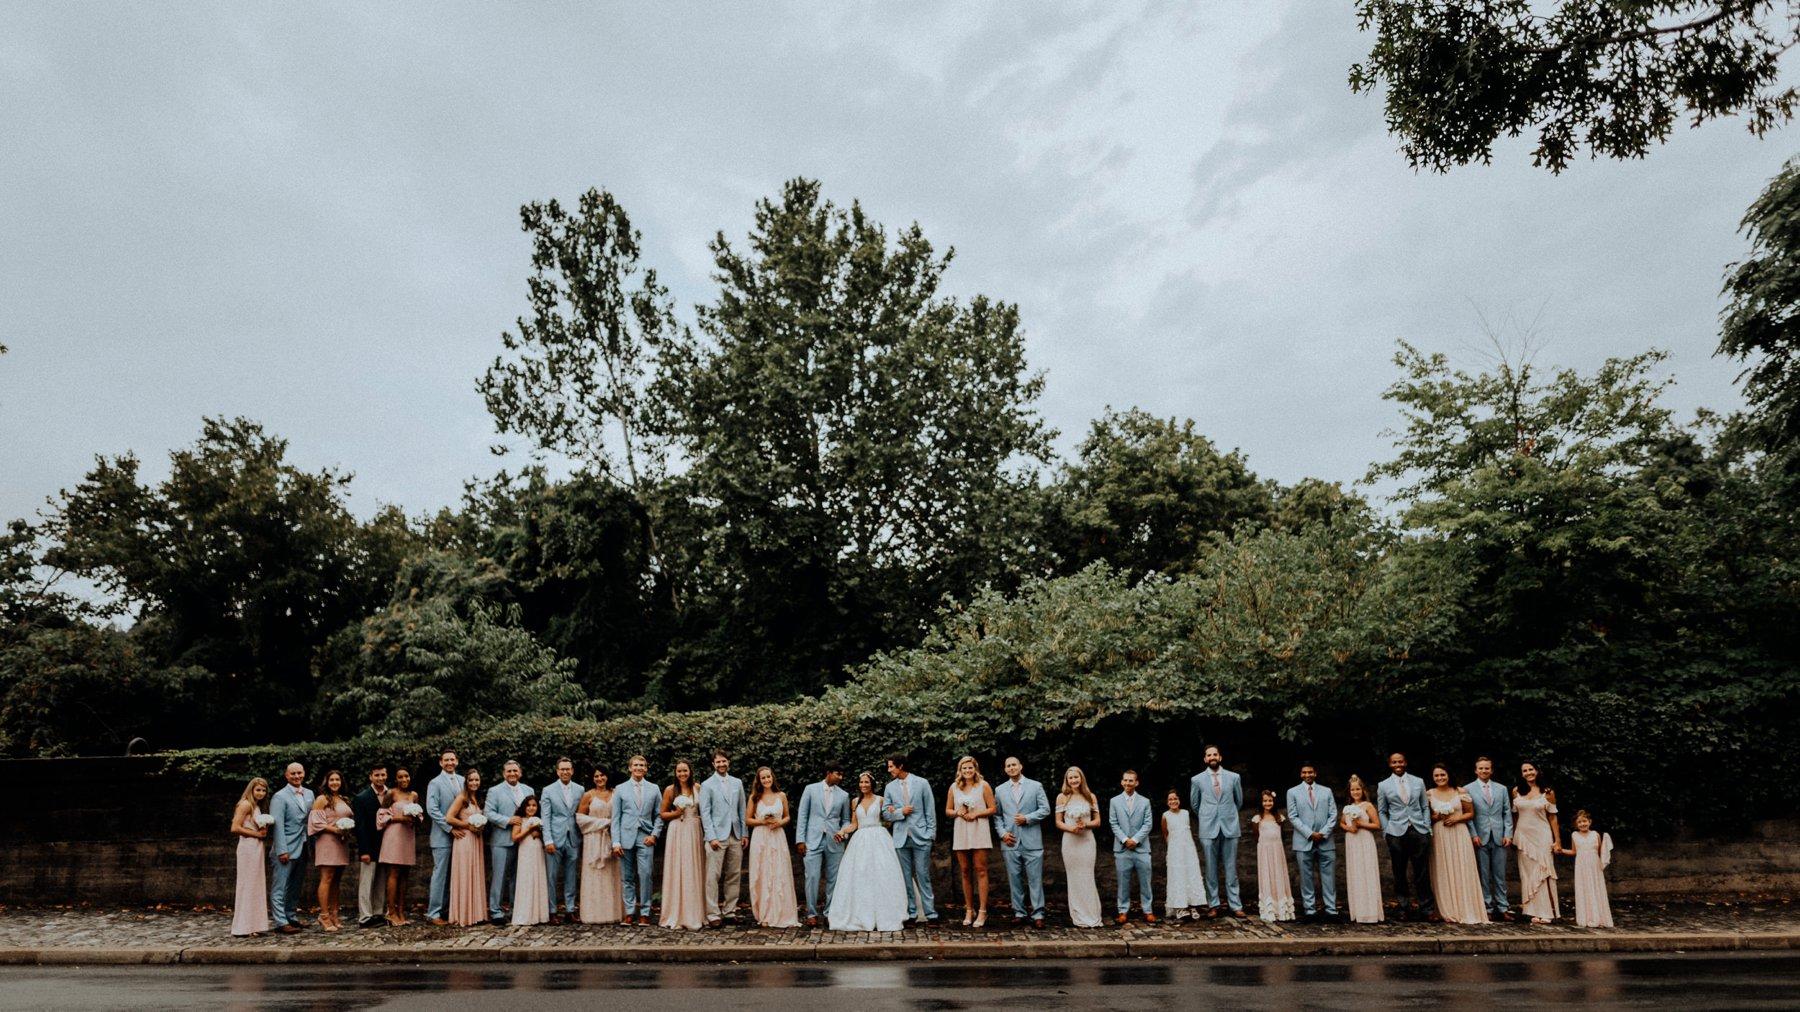 084-063-Artesano-iron-works-wedding-3.jpg